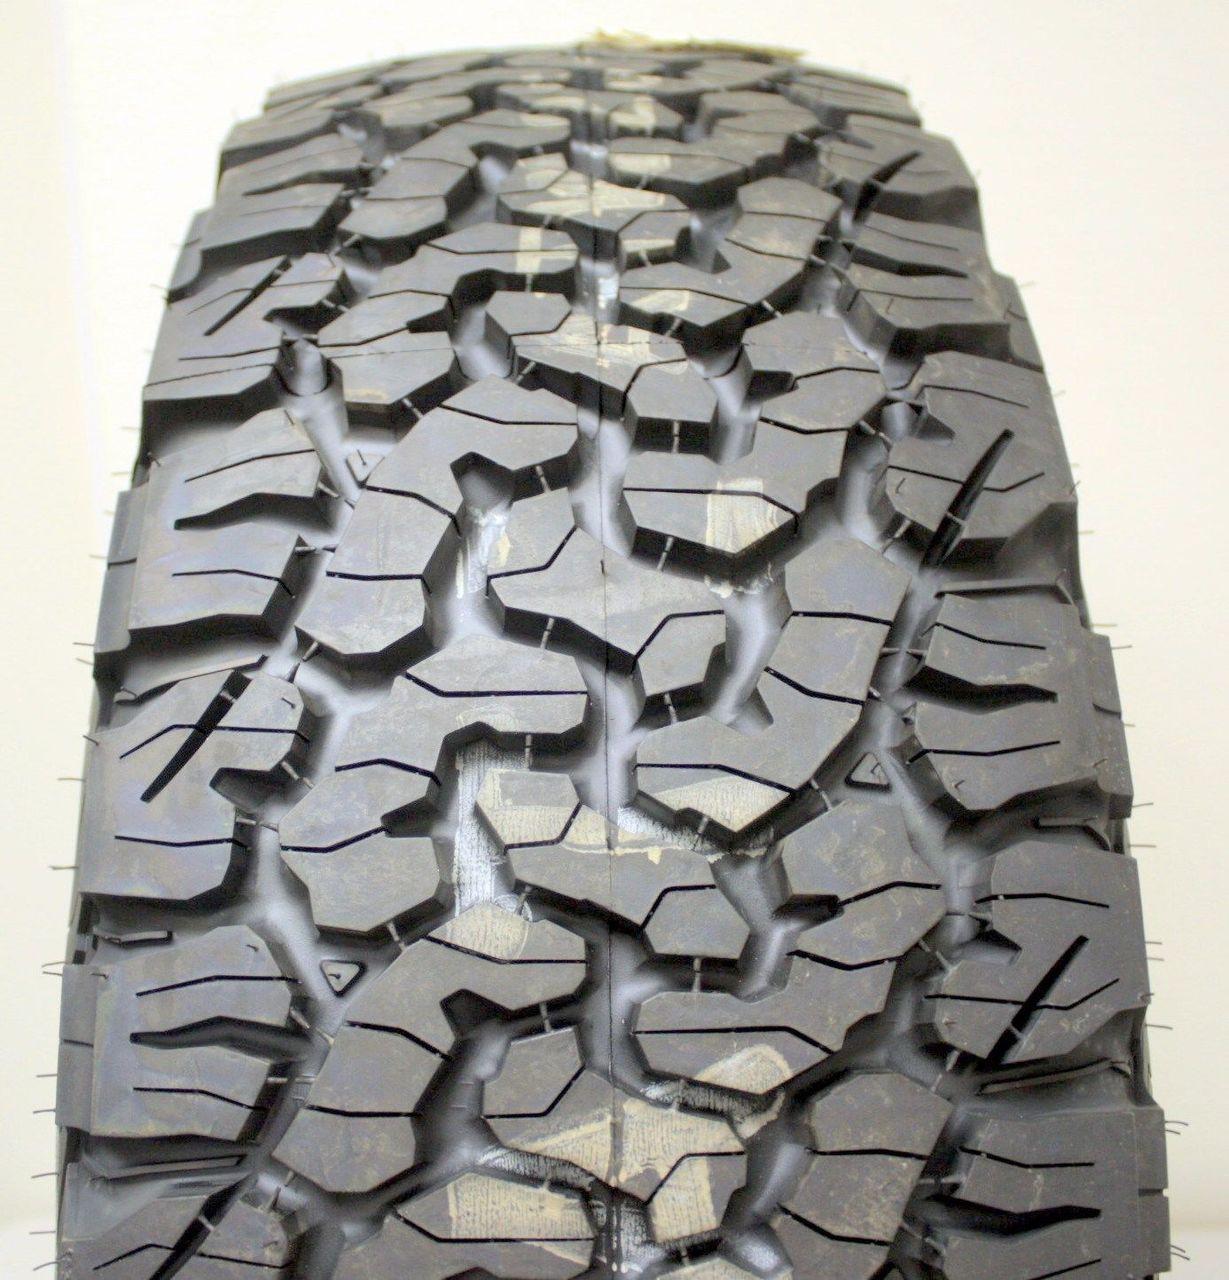 "20"" 8 Lug 8-180 Chrome Wheels With BFG A/T KO2 275/65/20 Tires for 2011-2018 Chevy Silverado HD 2500 3500 - New Set of 4"